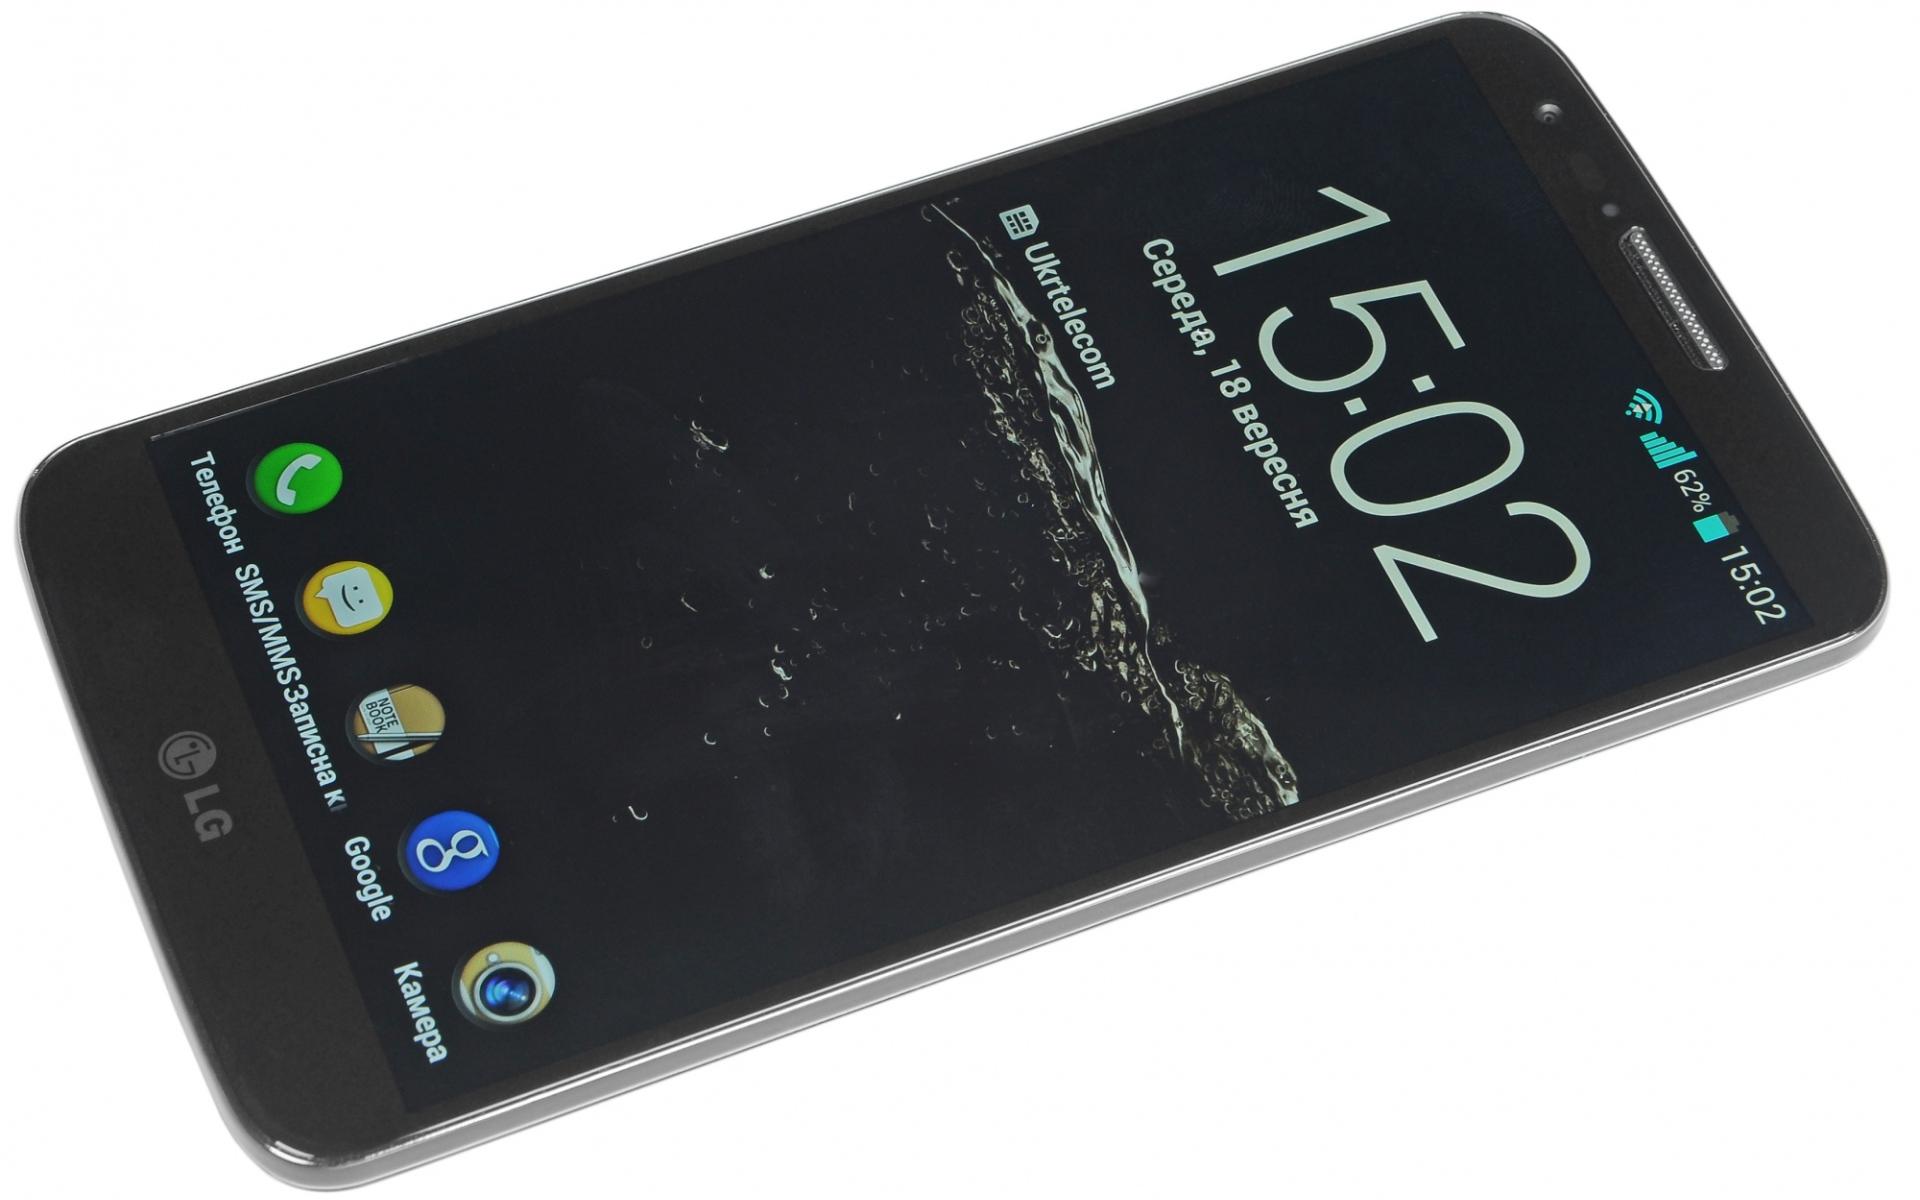 hi tech обои - Смартфон LG g2 на белом фоне